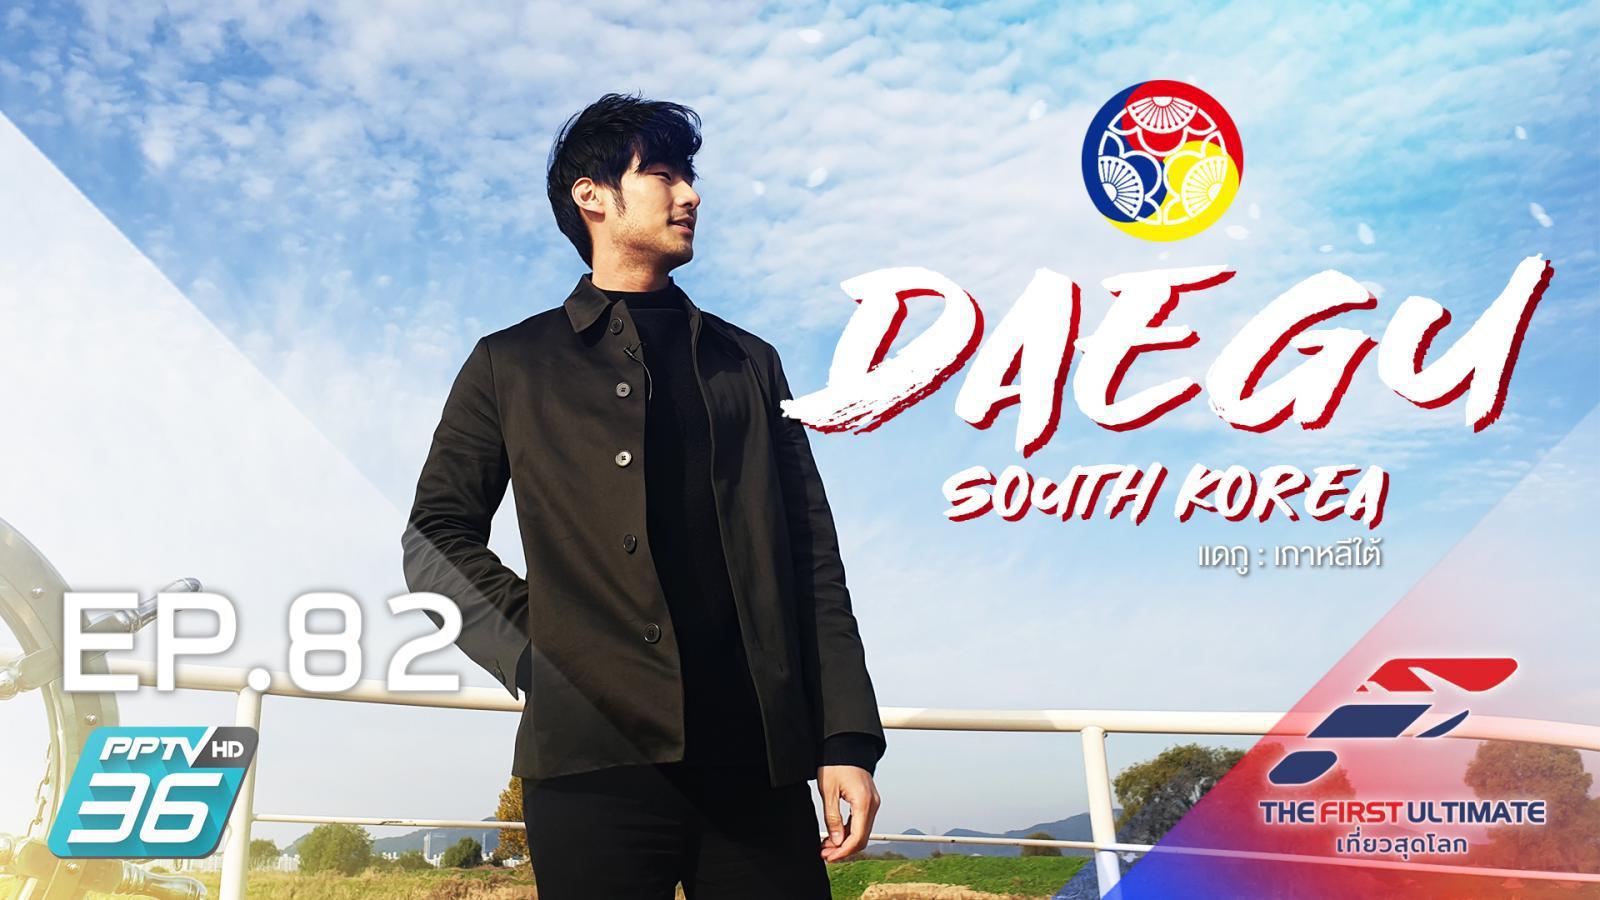 South Korea-Daegu ตอนที่ 2